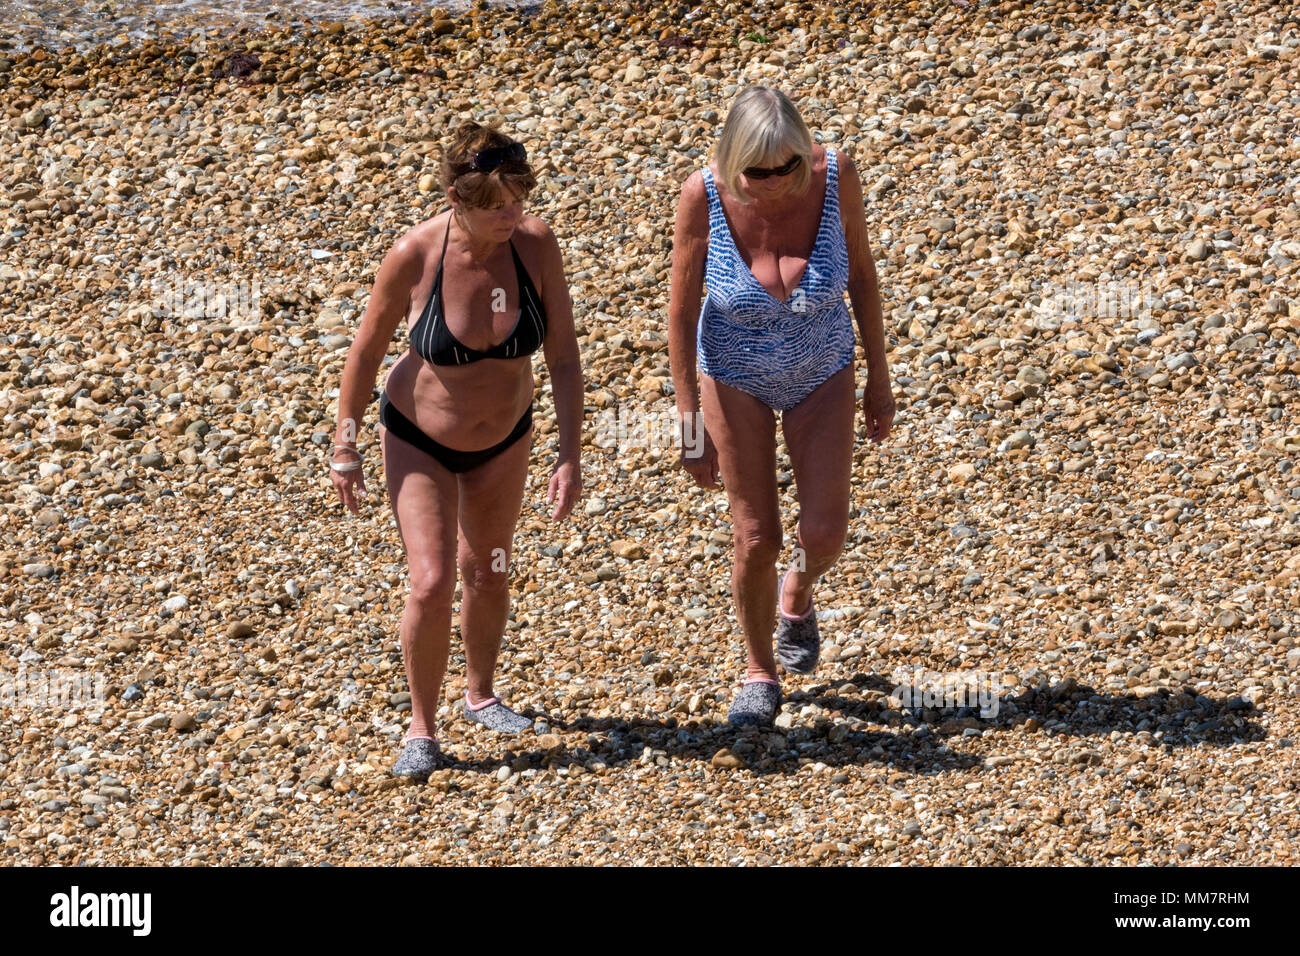 Middle Sunbathing Photosamp; Stock Aged Beach 76Ybfvgy